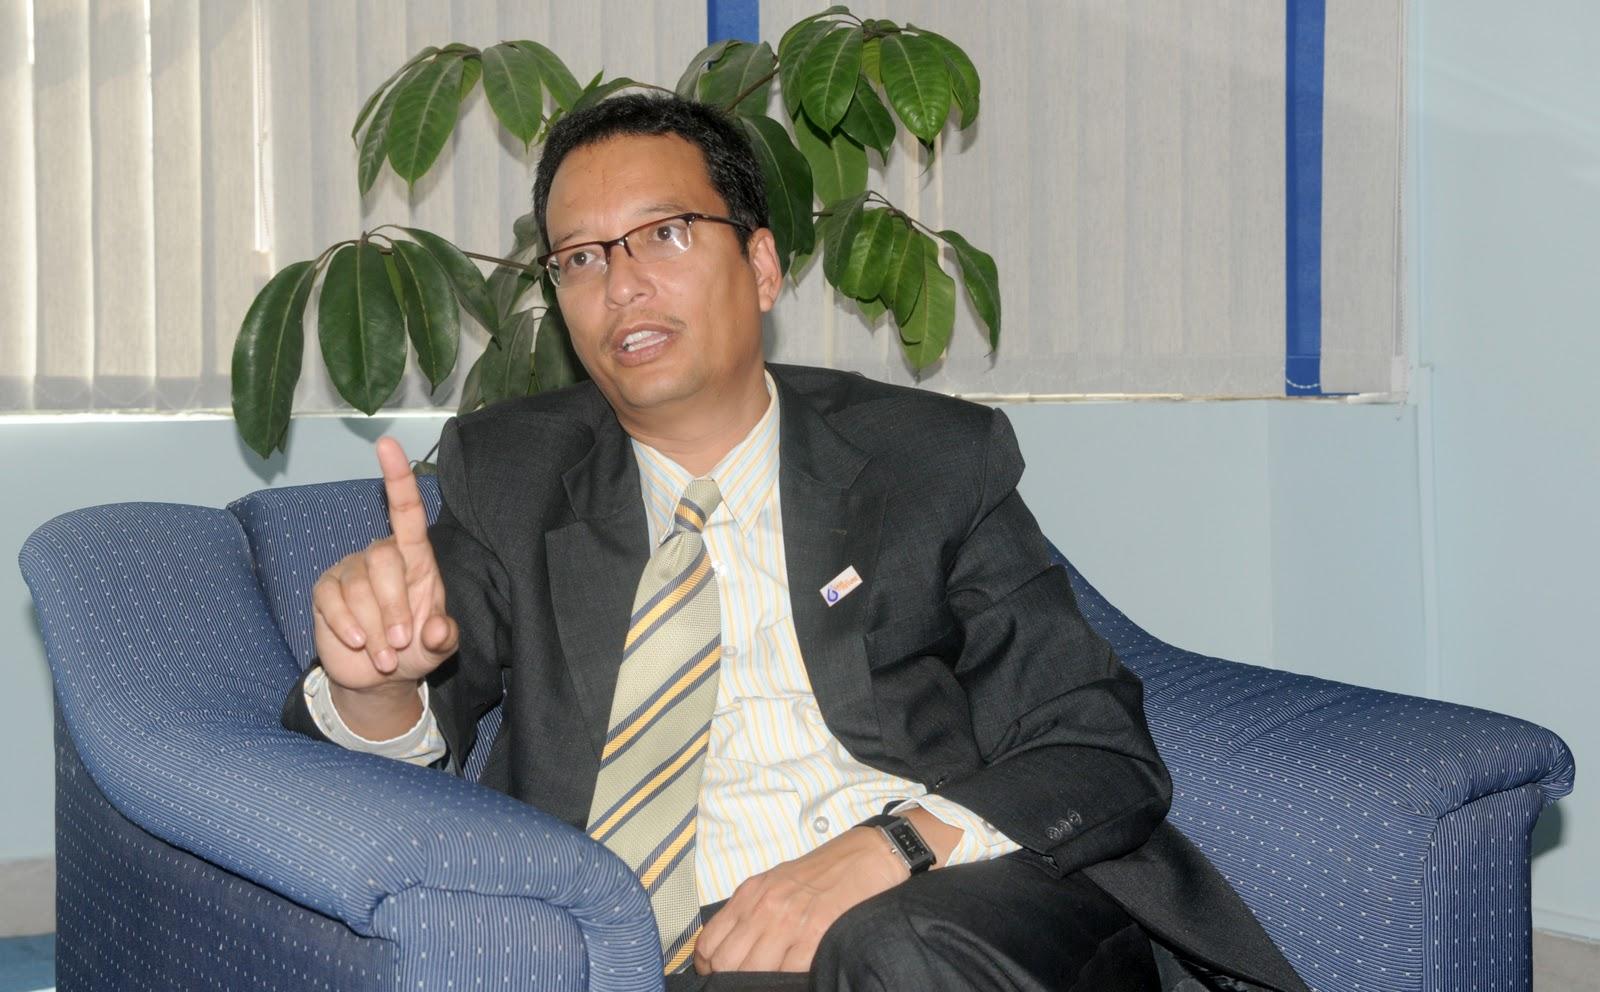 बैंक अफ काठमाडौँका पूर्वप्रमुख कार्यकारी अधिकृतसहित ११ जना पक्राउ